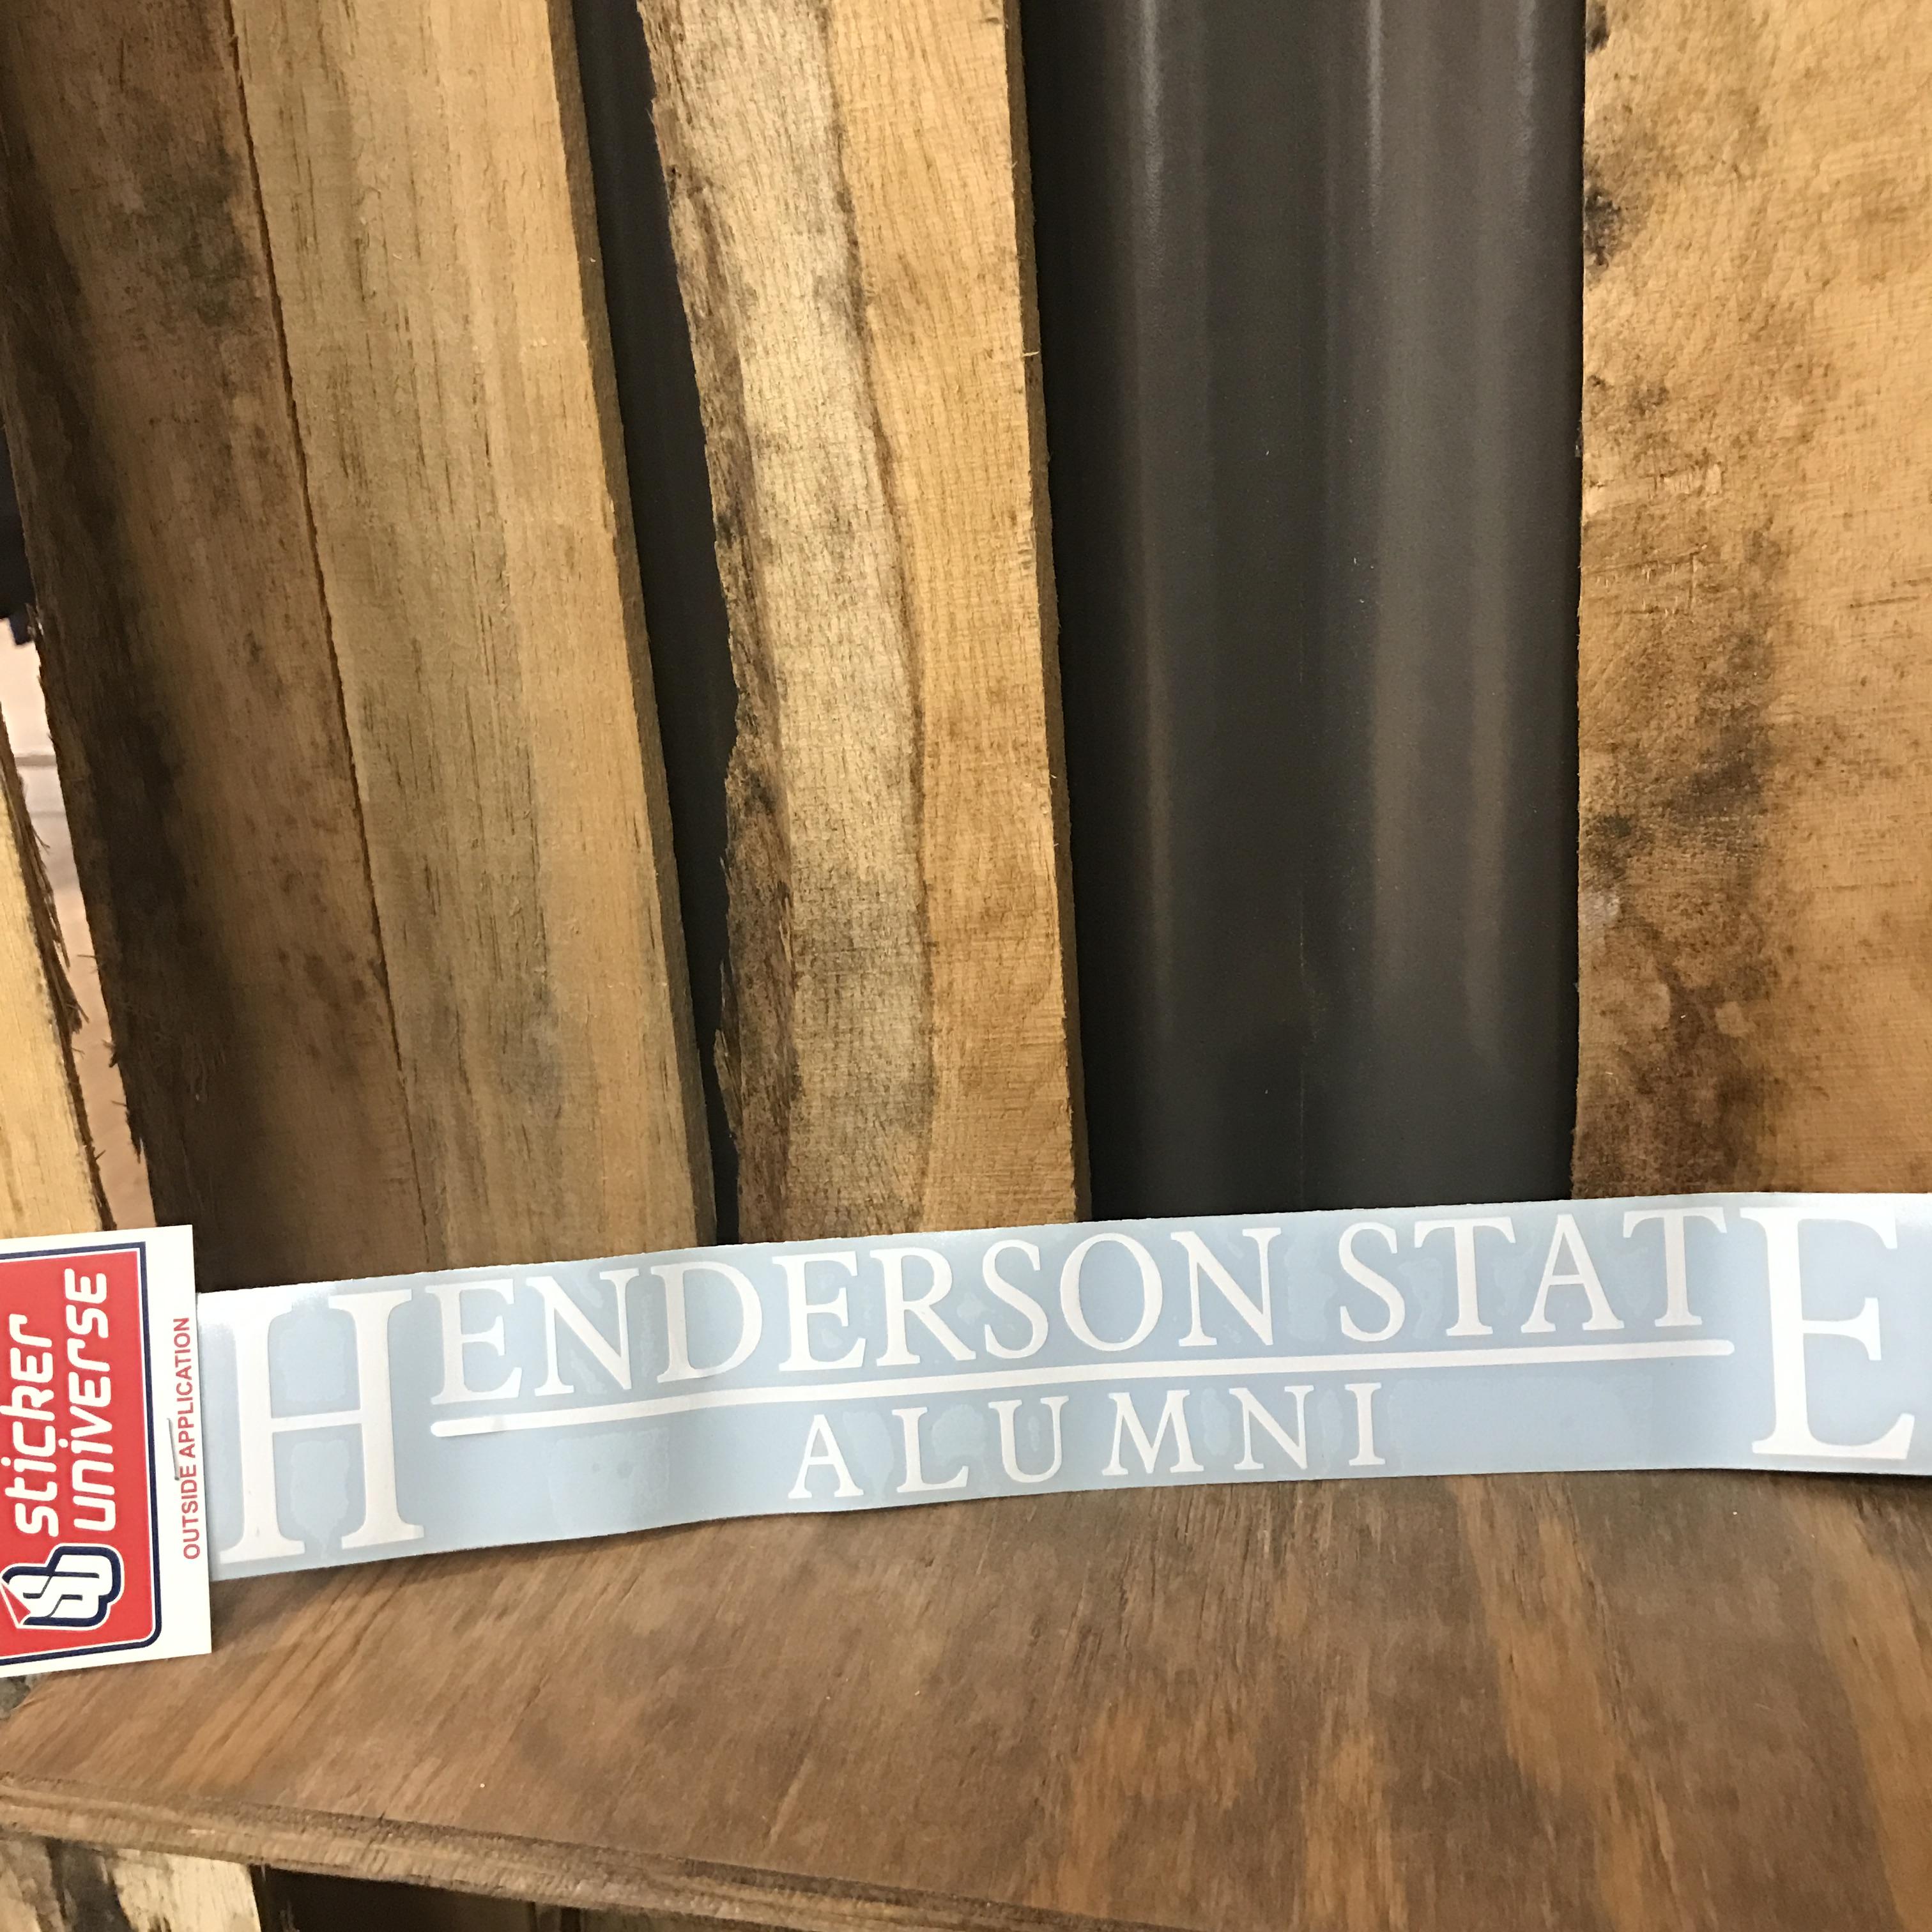 Henderson State Alumni